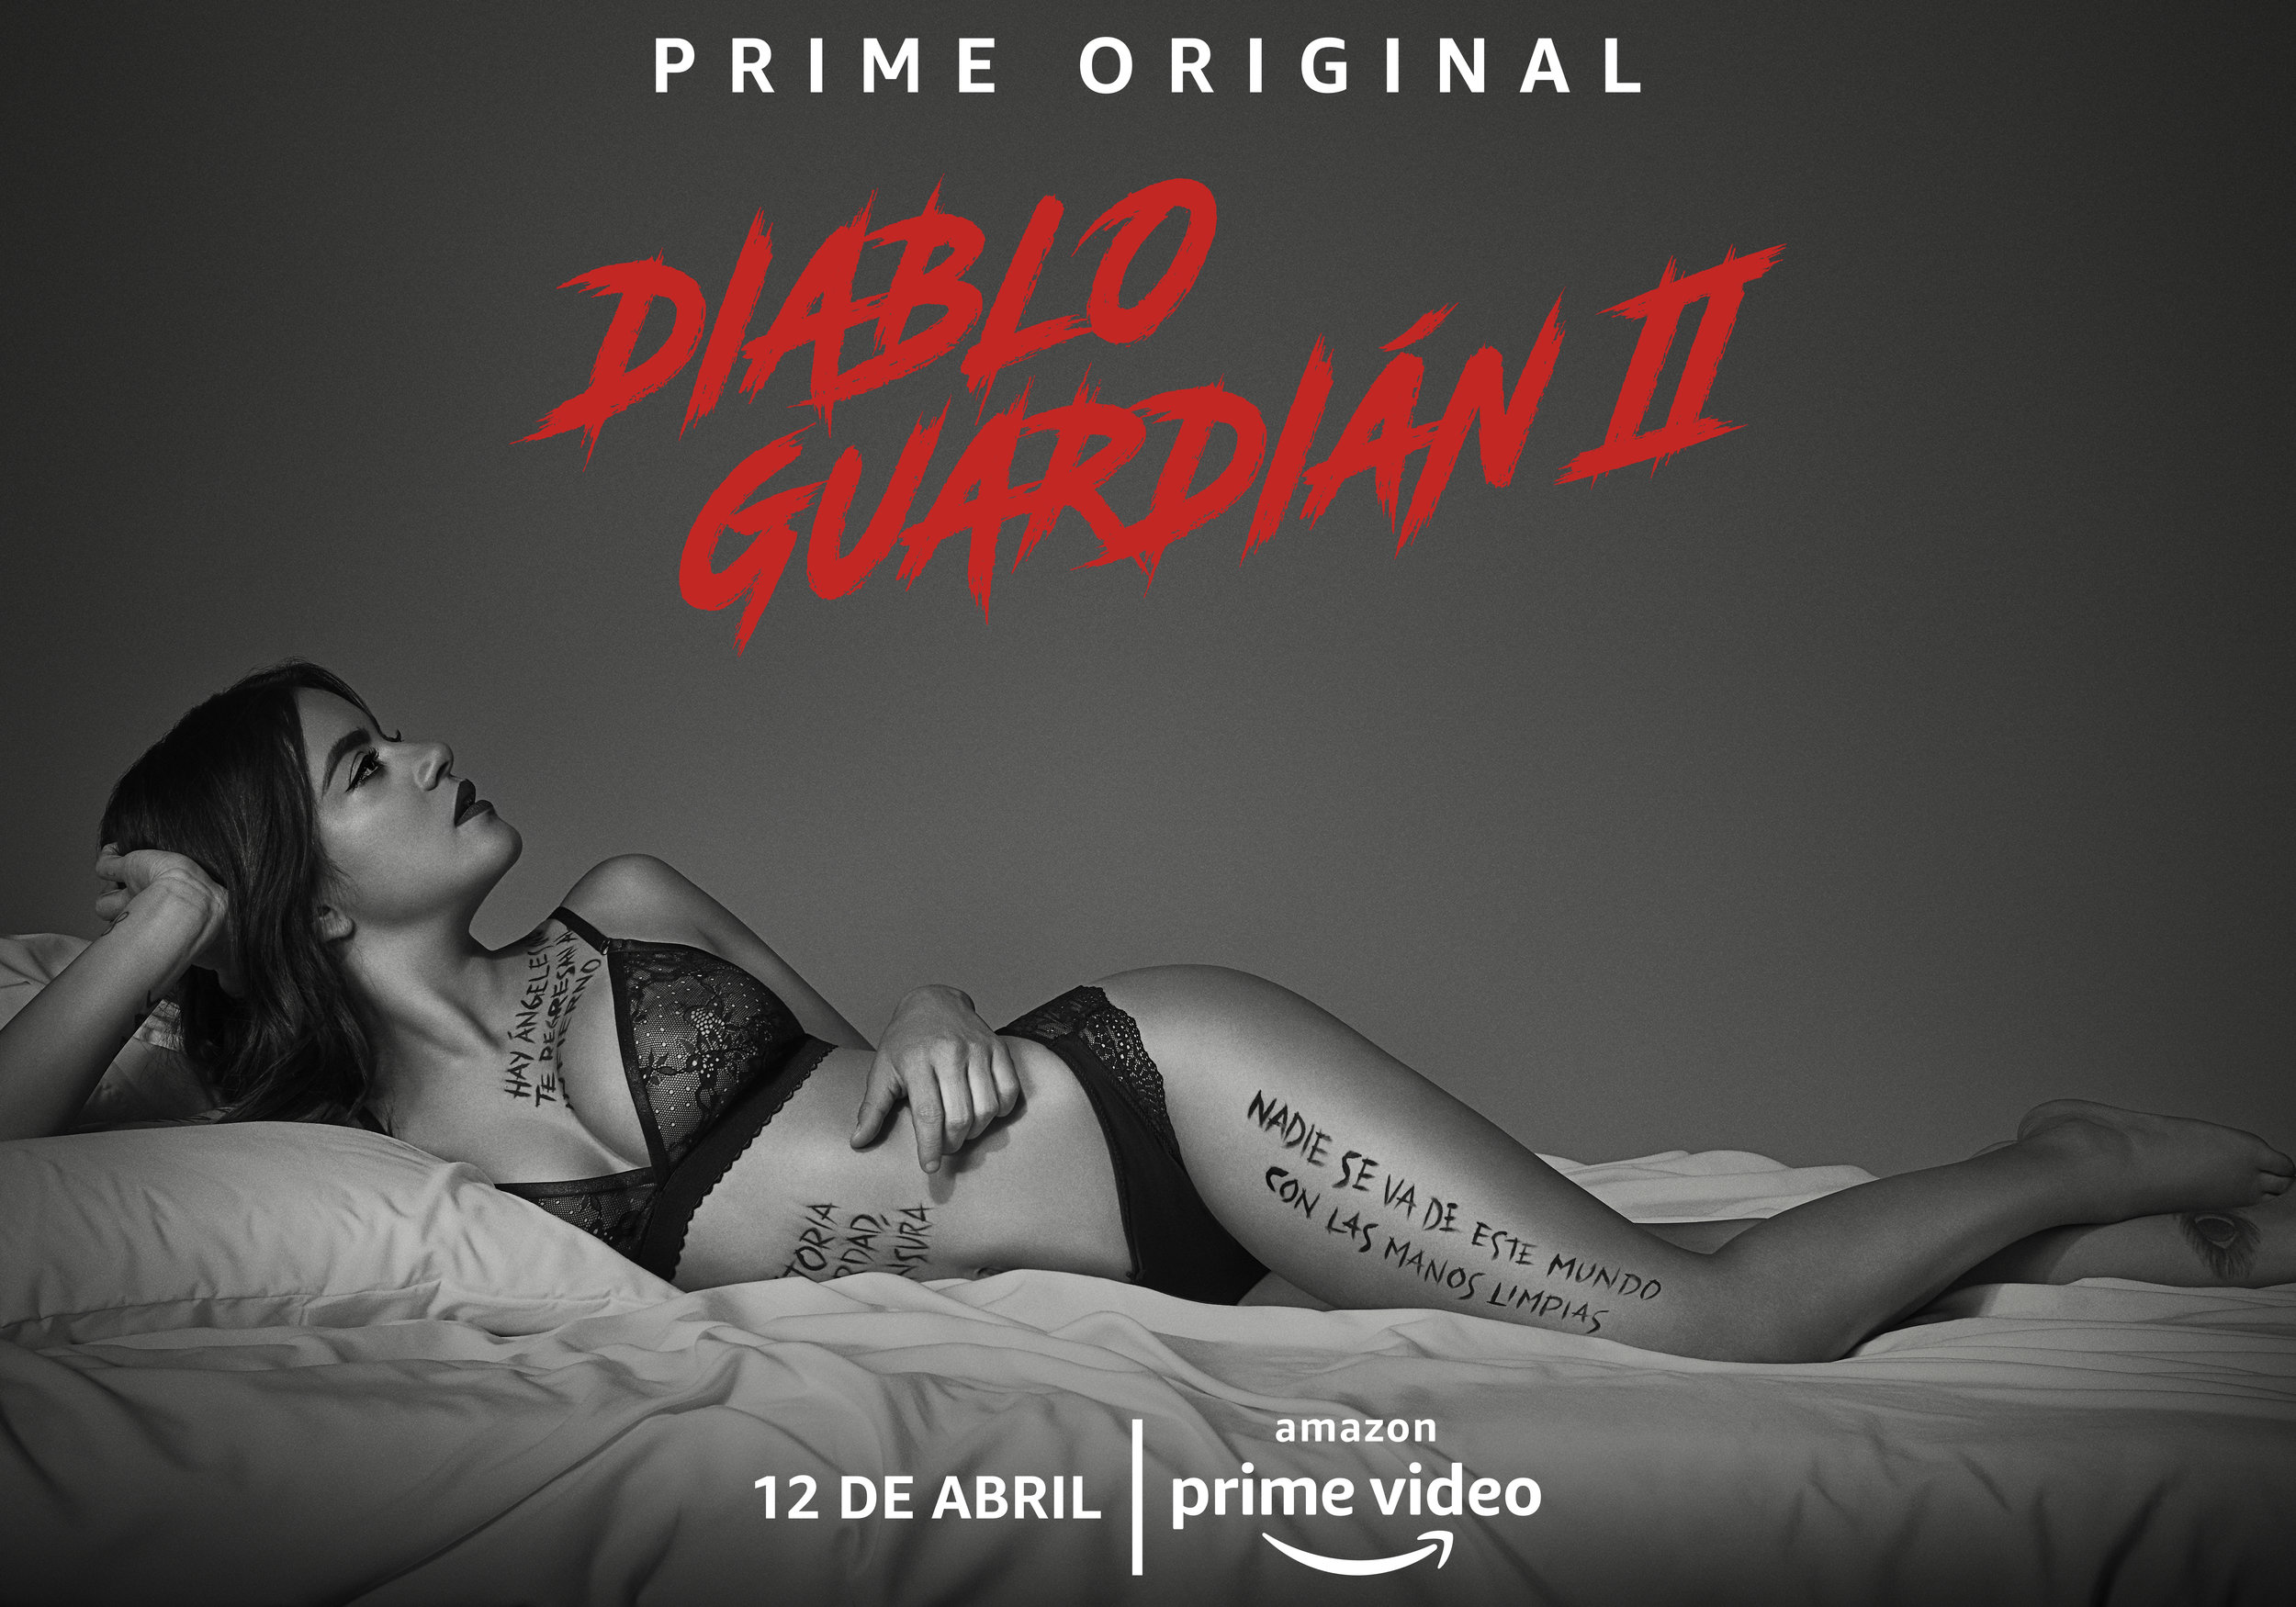 Diablo Guardián 2